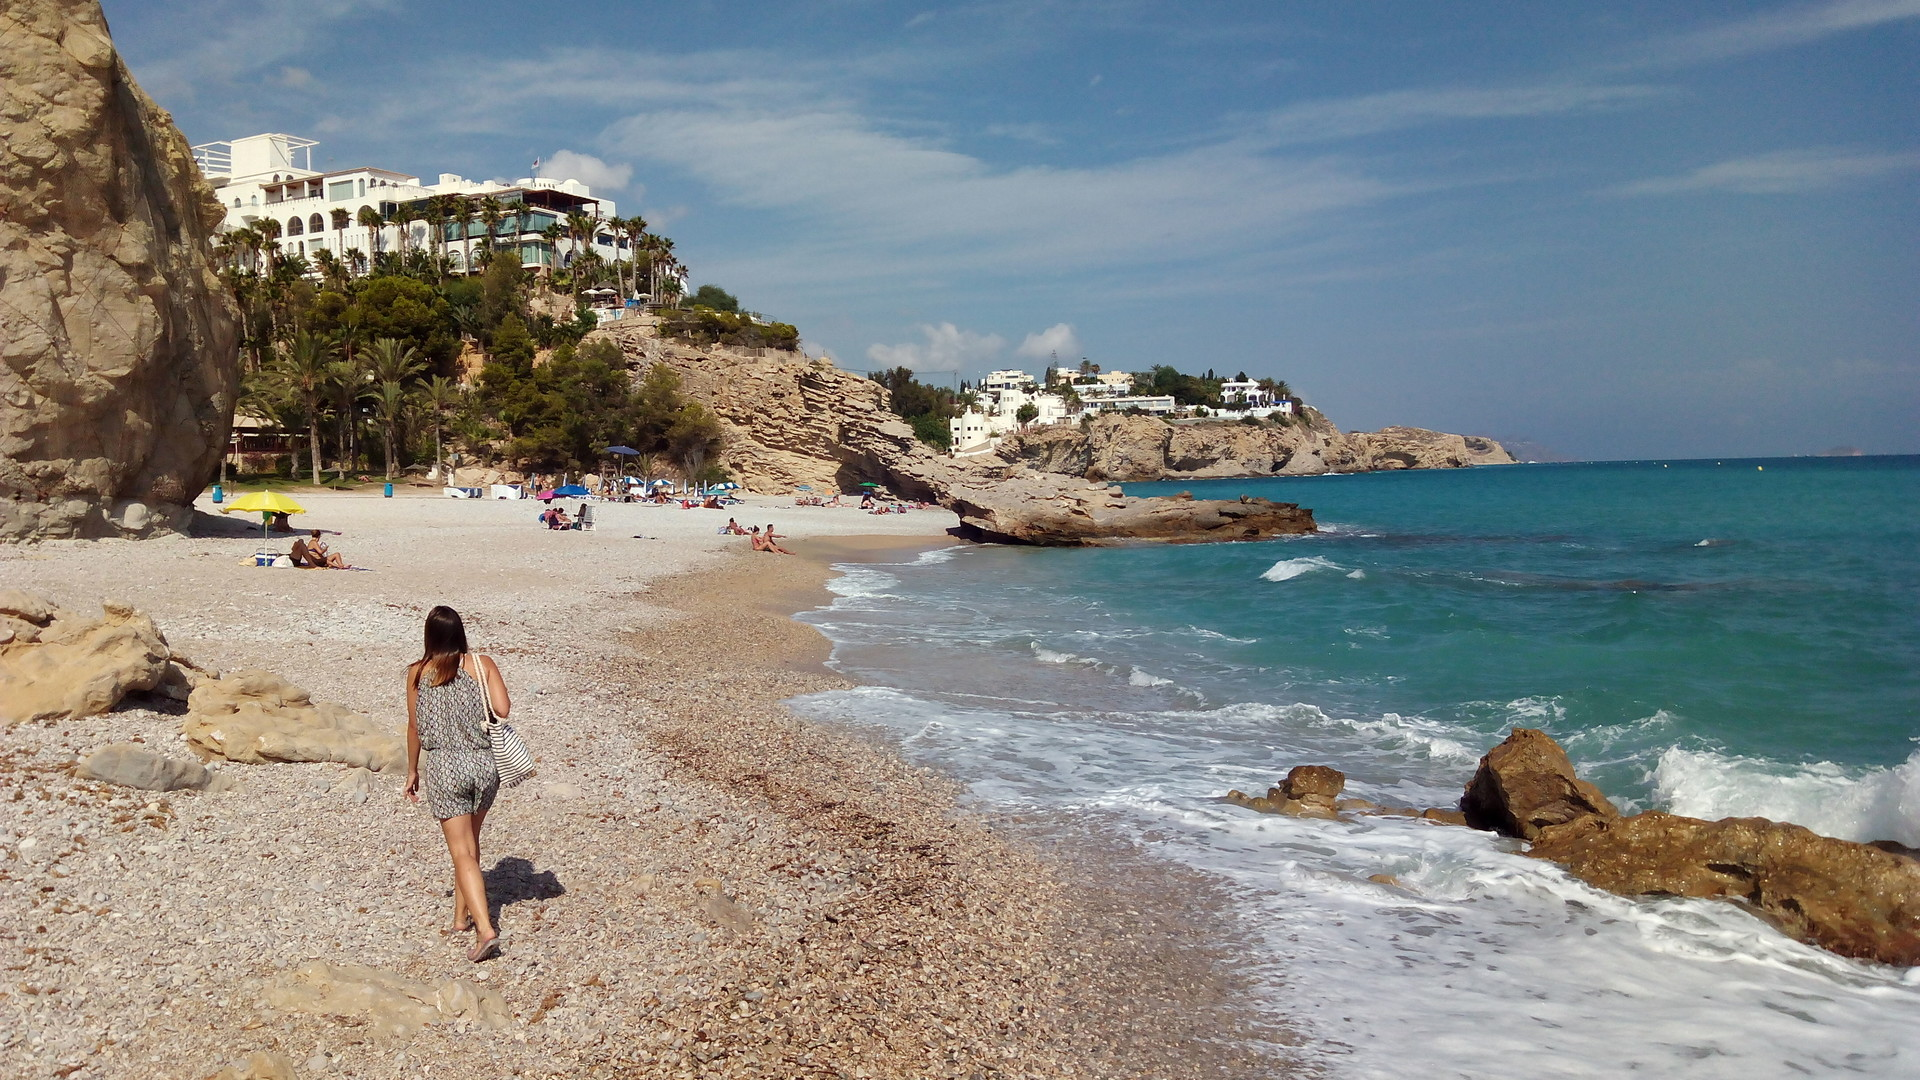 Playa Las Monjas